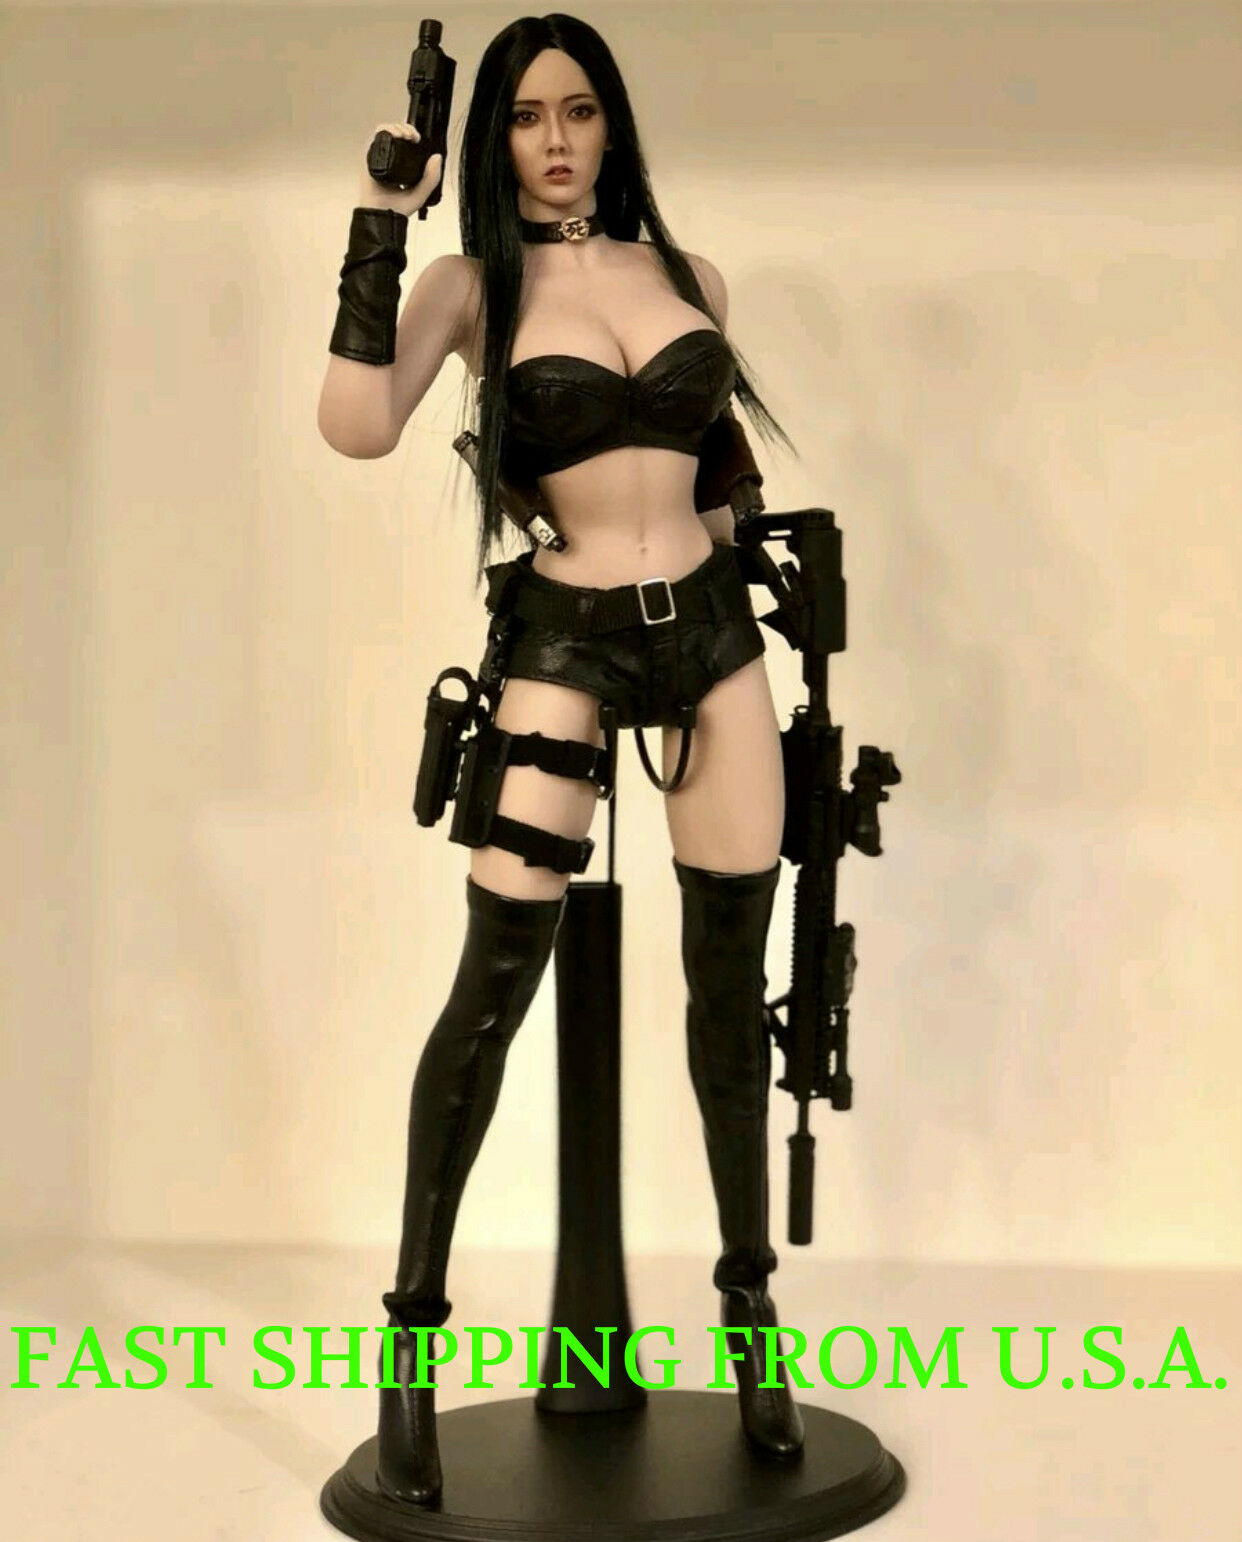 Phicen 1 6 figura femenina transparente largo cabello negro belleza asiática juego de muñeca ❶ USA ❶